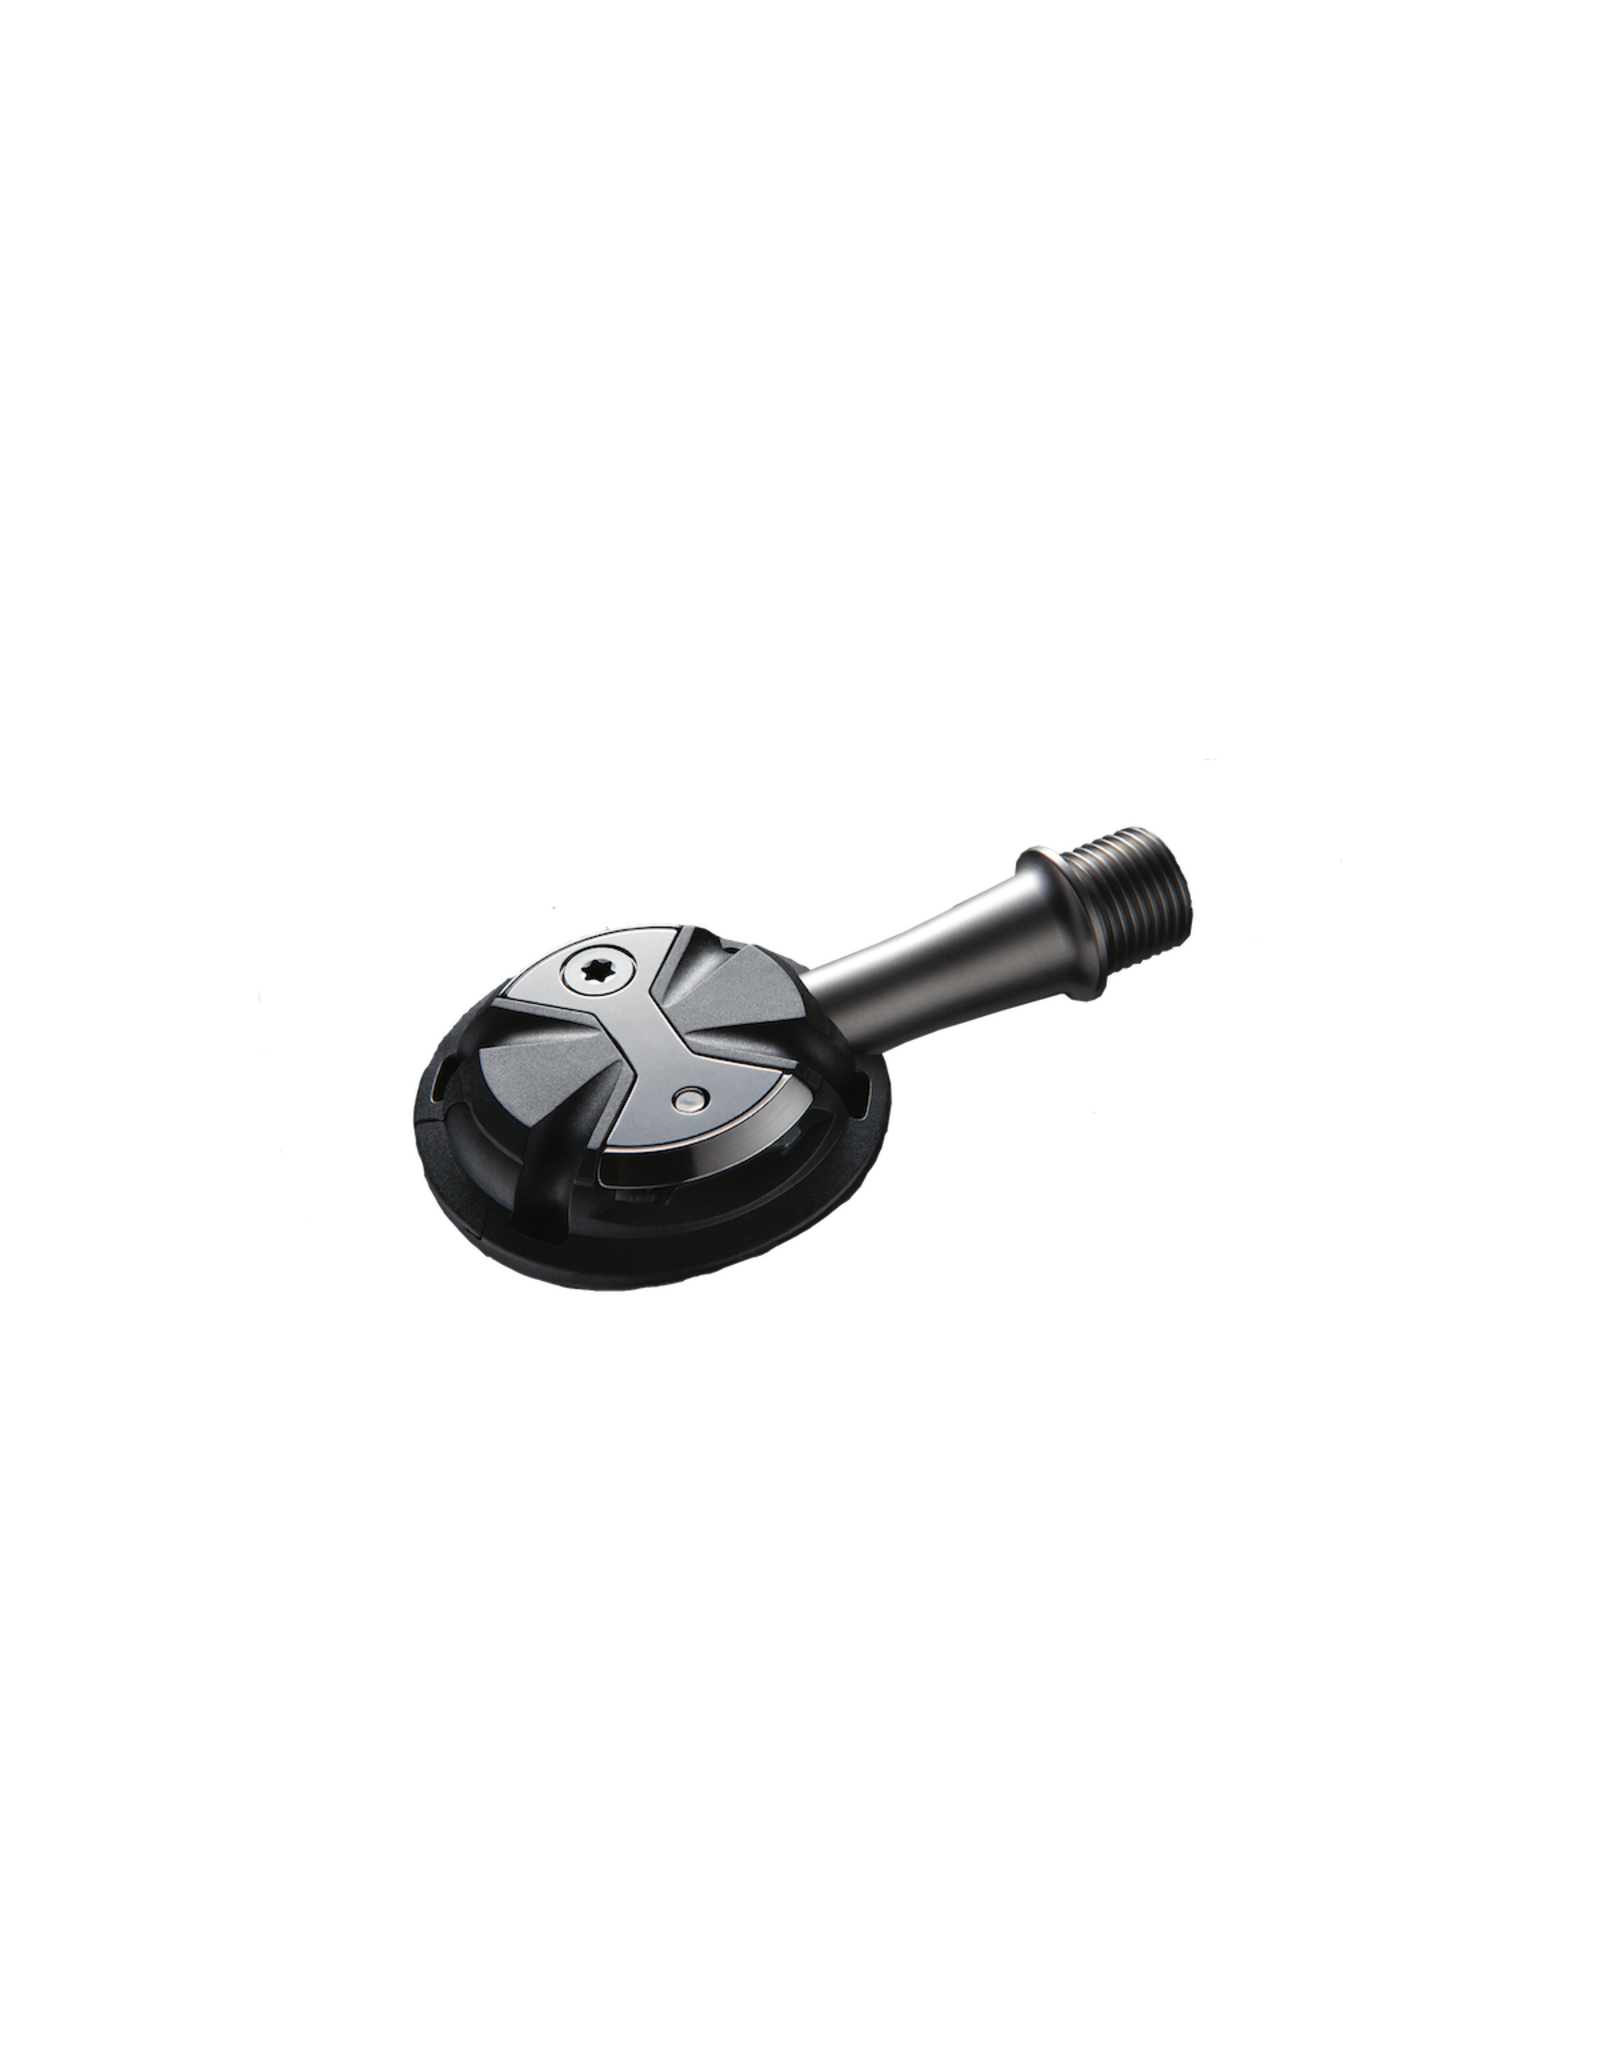 Speedplay Speedplay Zero Aero Stainless Steel Pedals + Walkable Cleats